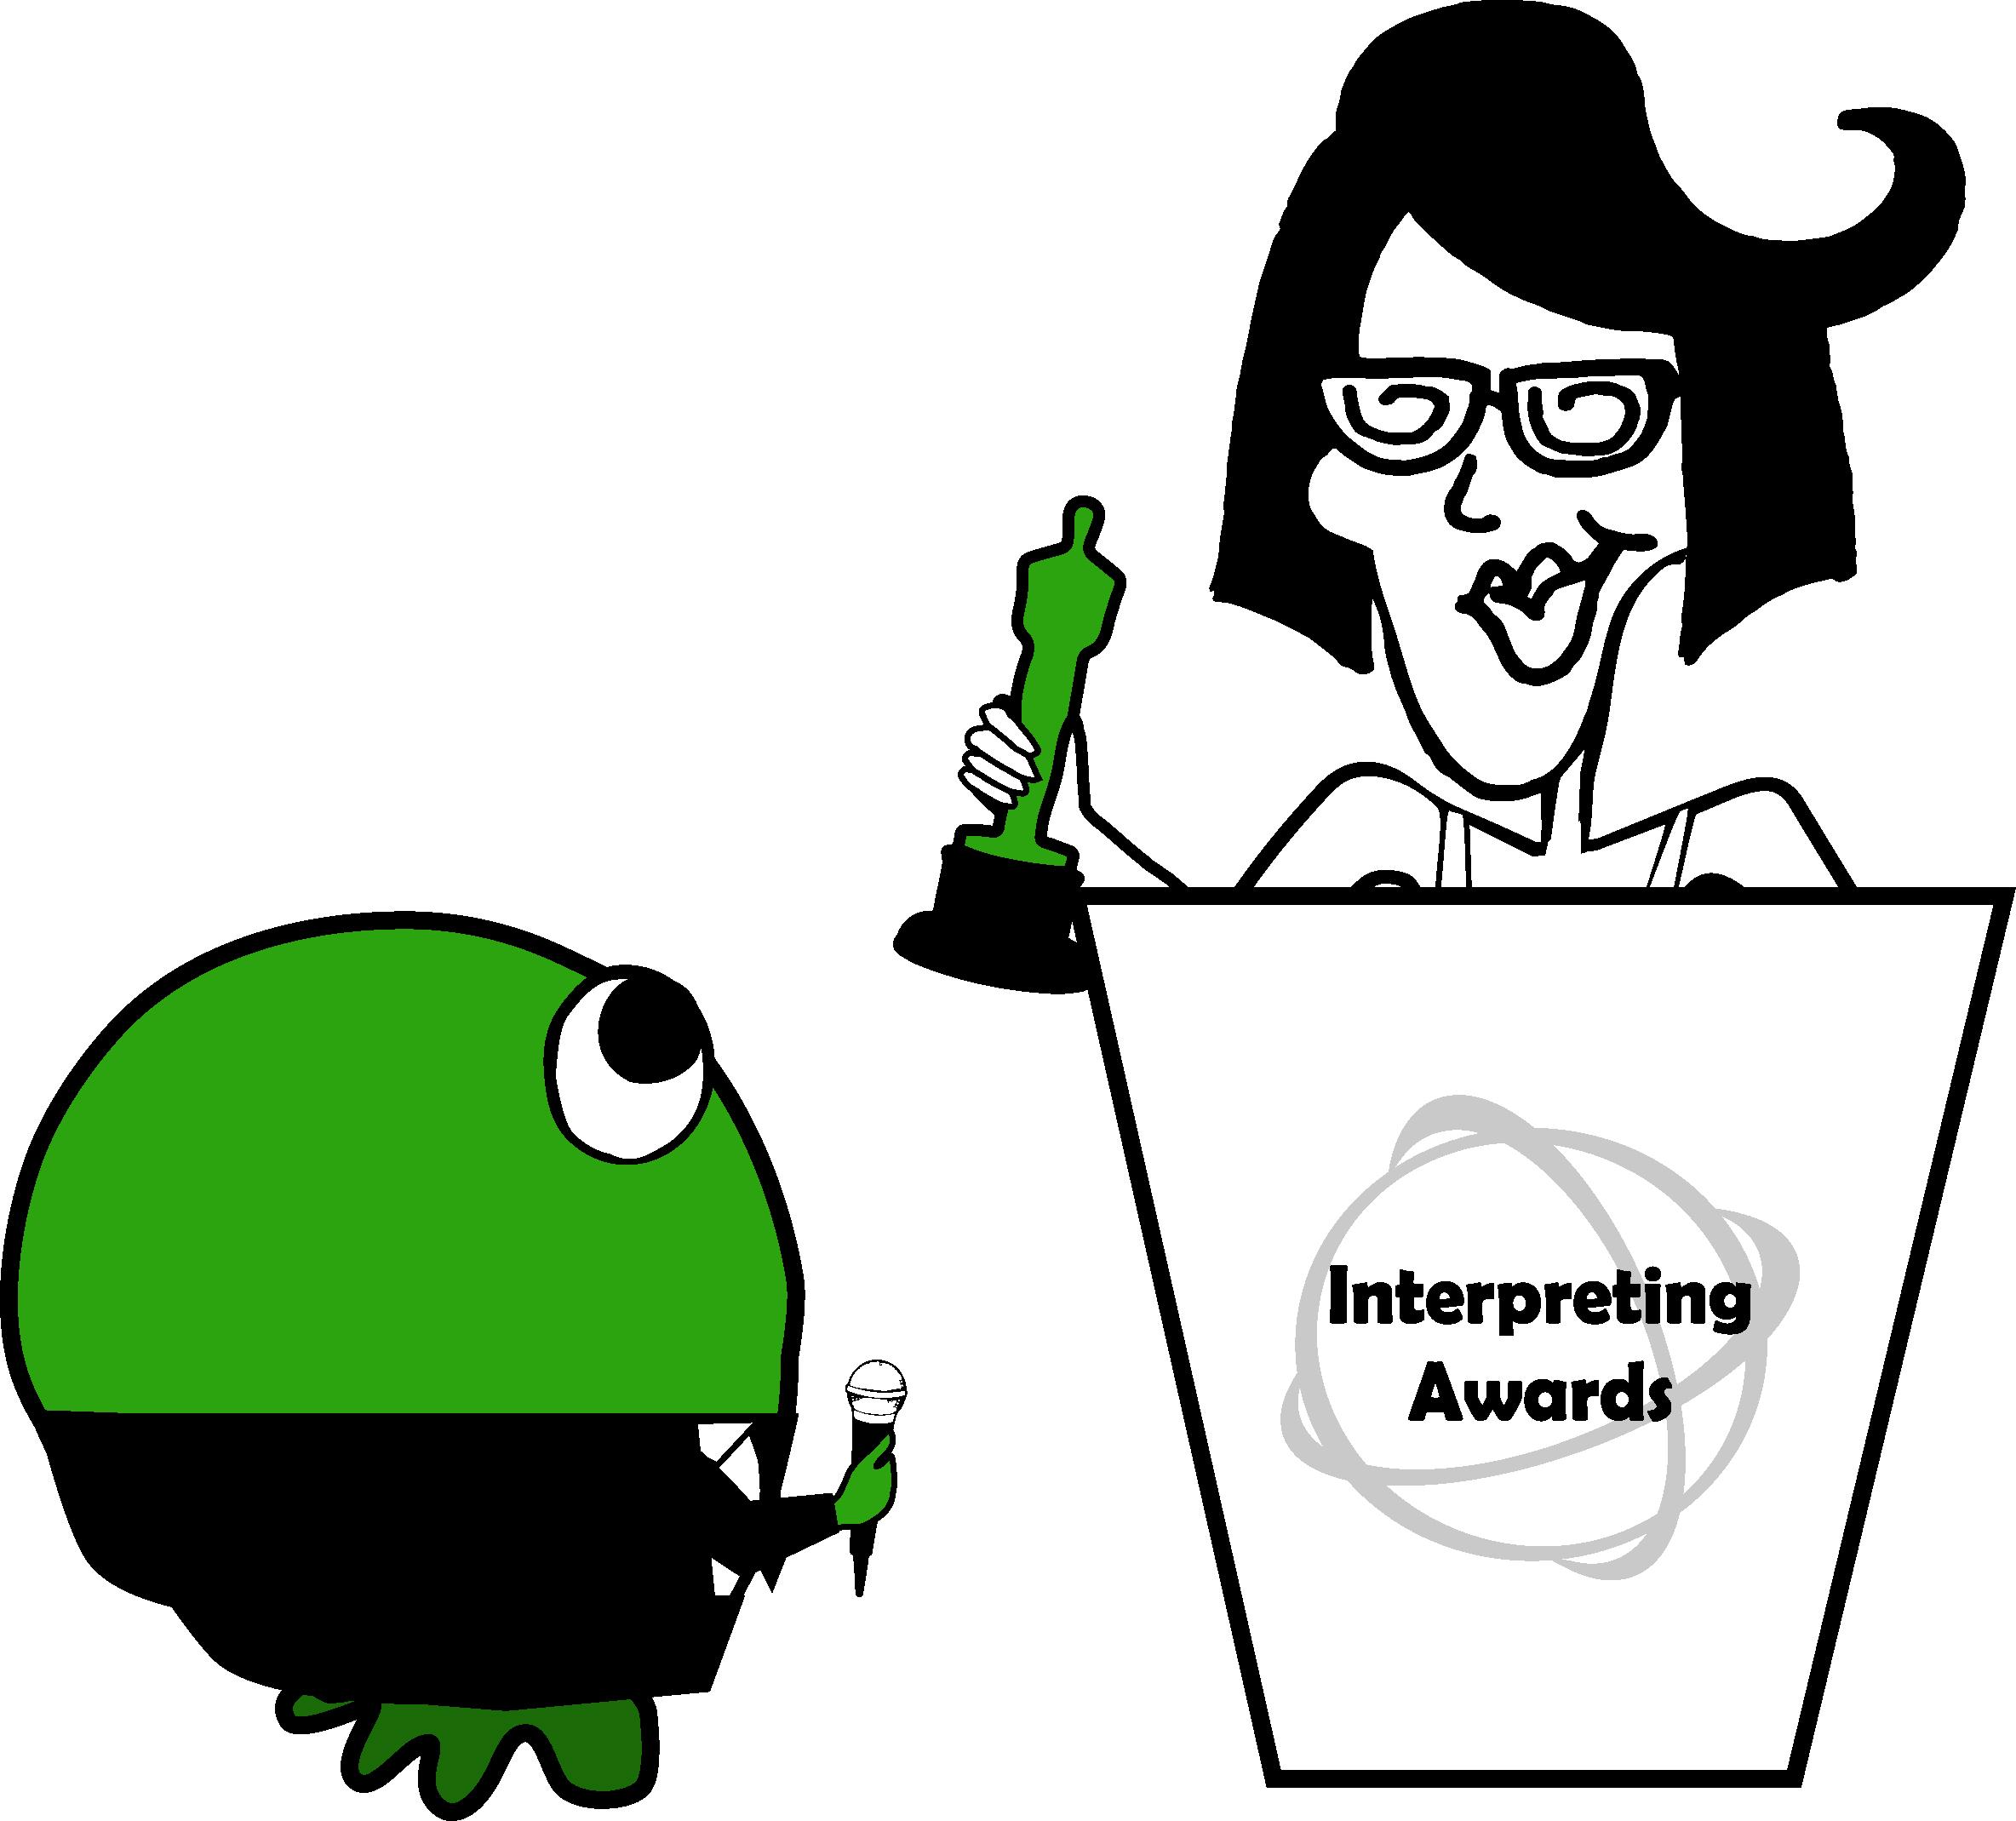 popular interpreter, atlas translations, professionalism, tips, communication, translation agency